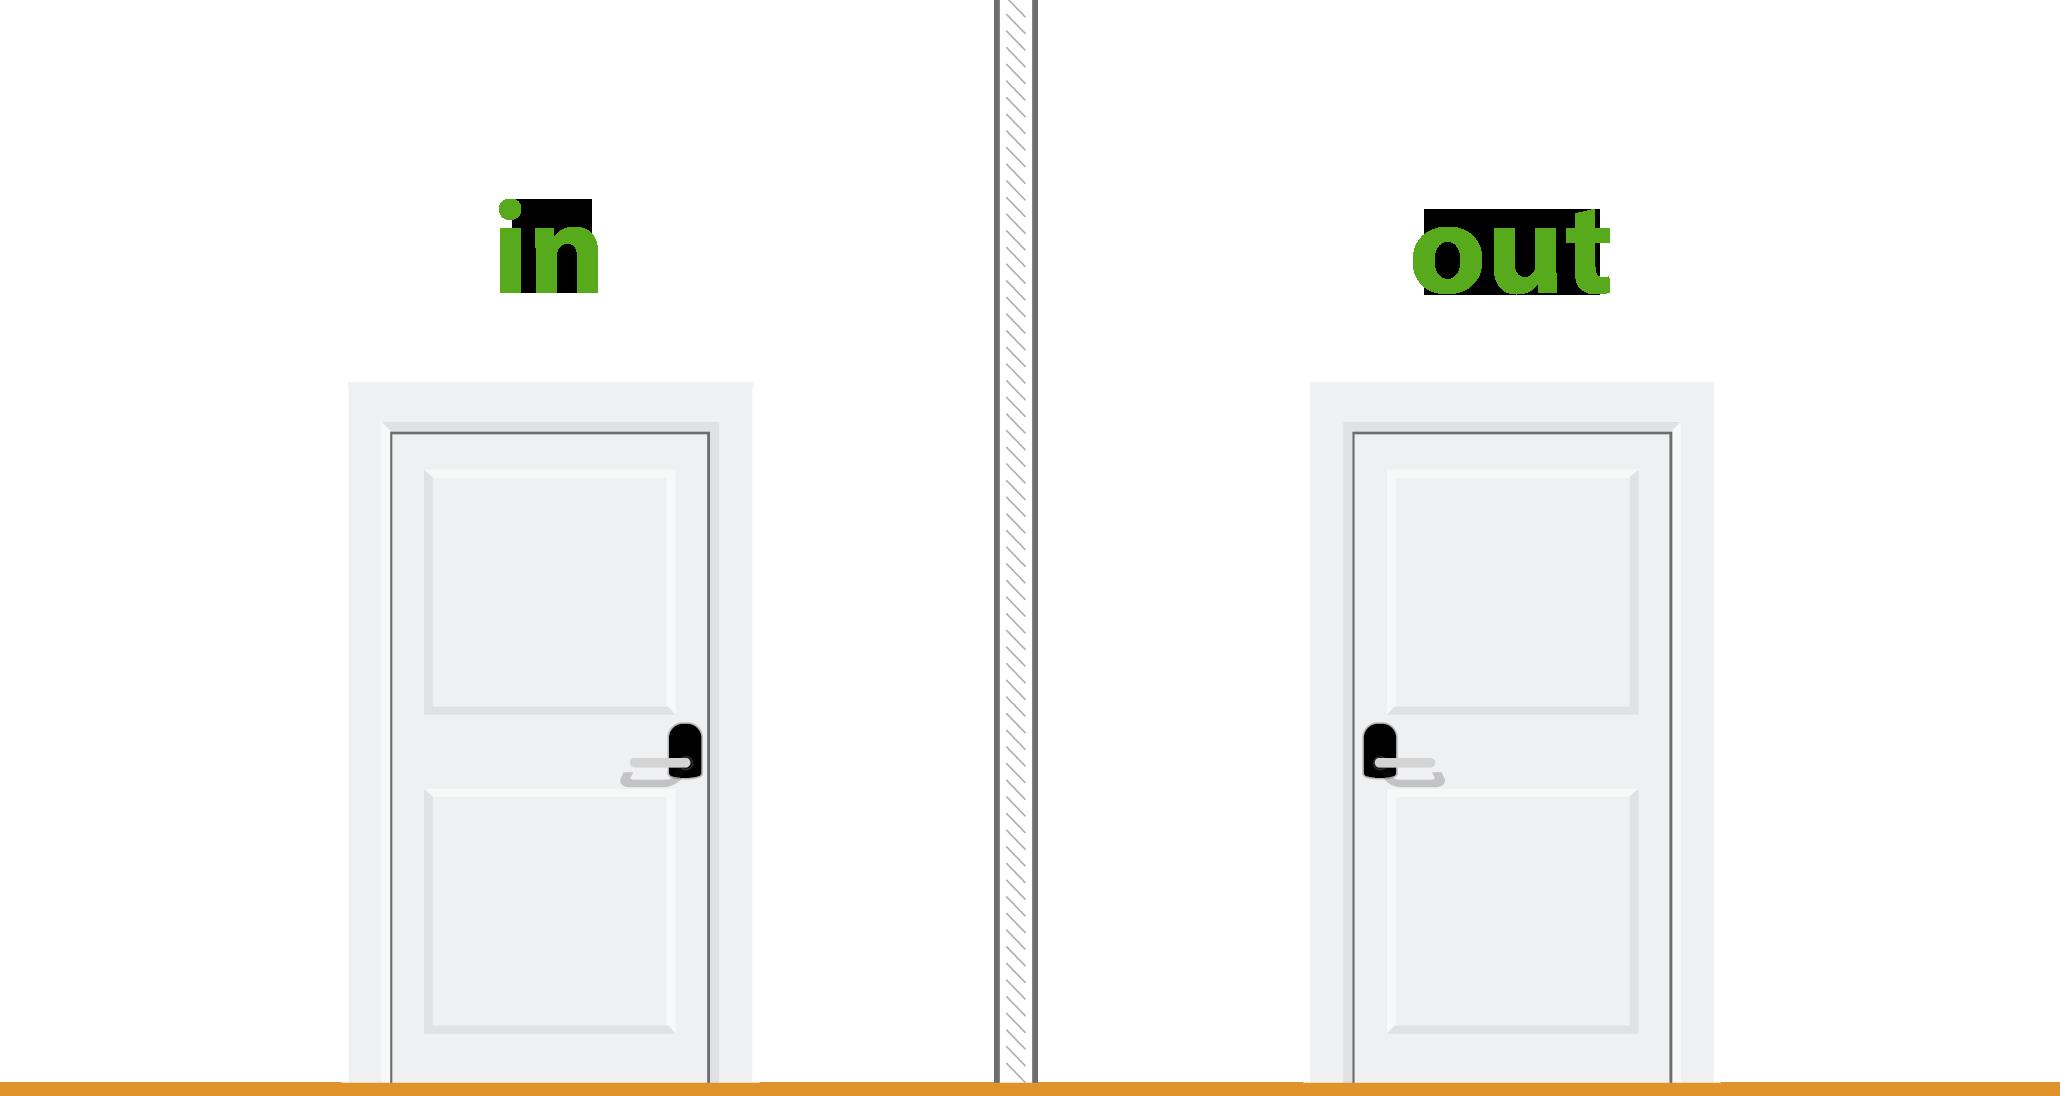 Hid Diagram Schematic Together With Door Access Control Wiring Diagram